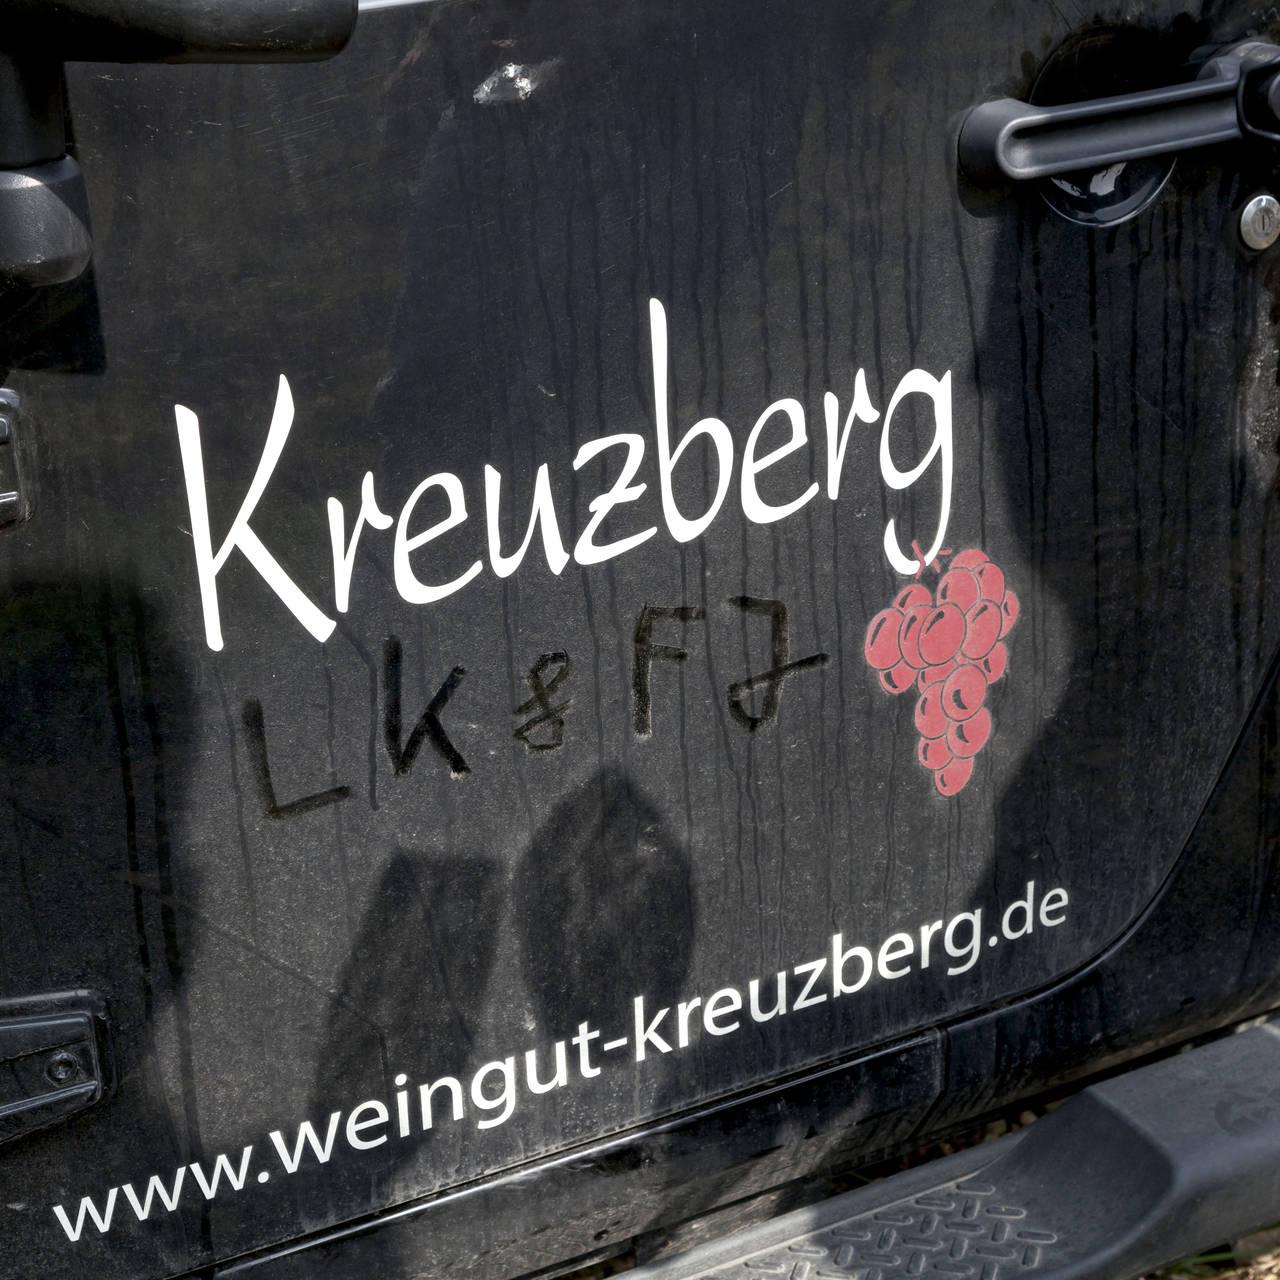 Weingut-Kreuzberg-Ahr-Holzfass